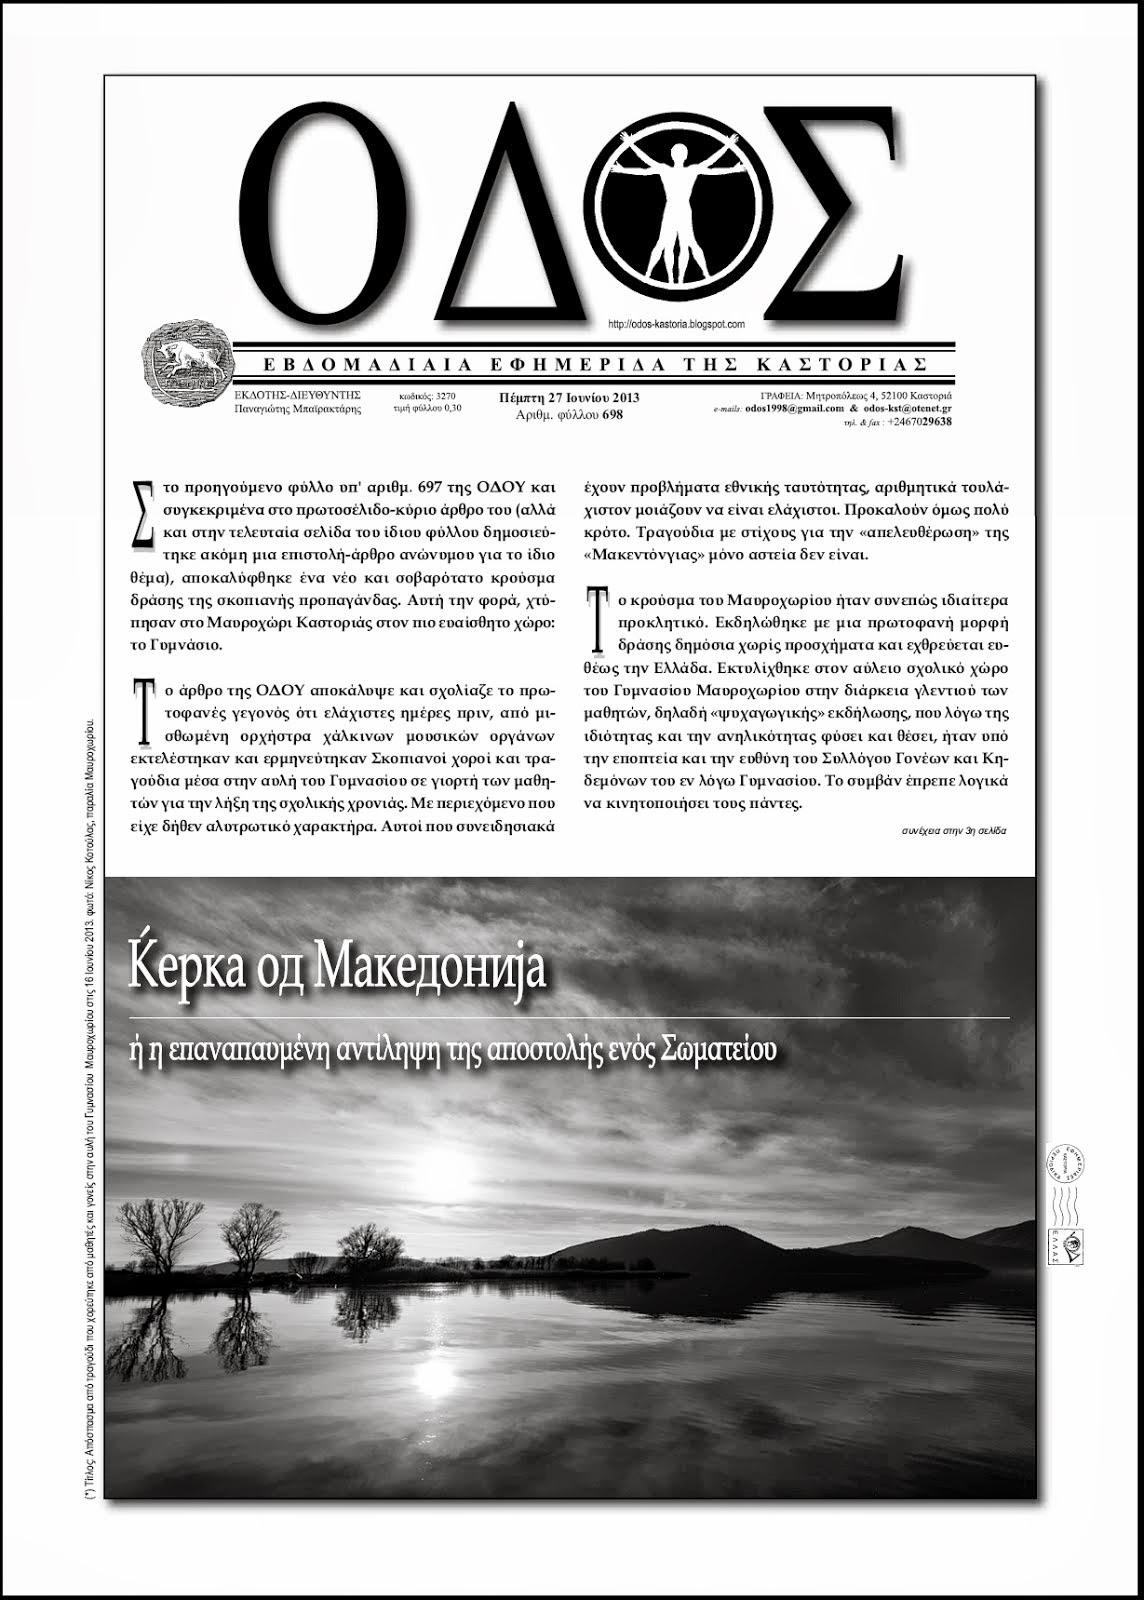 Ќерка од Македонија - ή η επαναπαυμένη αντίληψη της αποστολής ενός Σωματείου